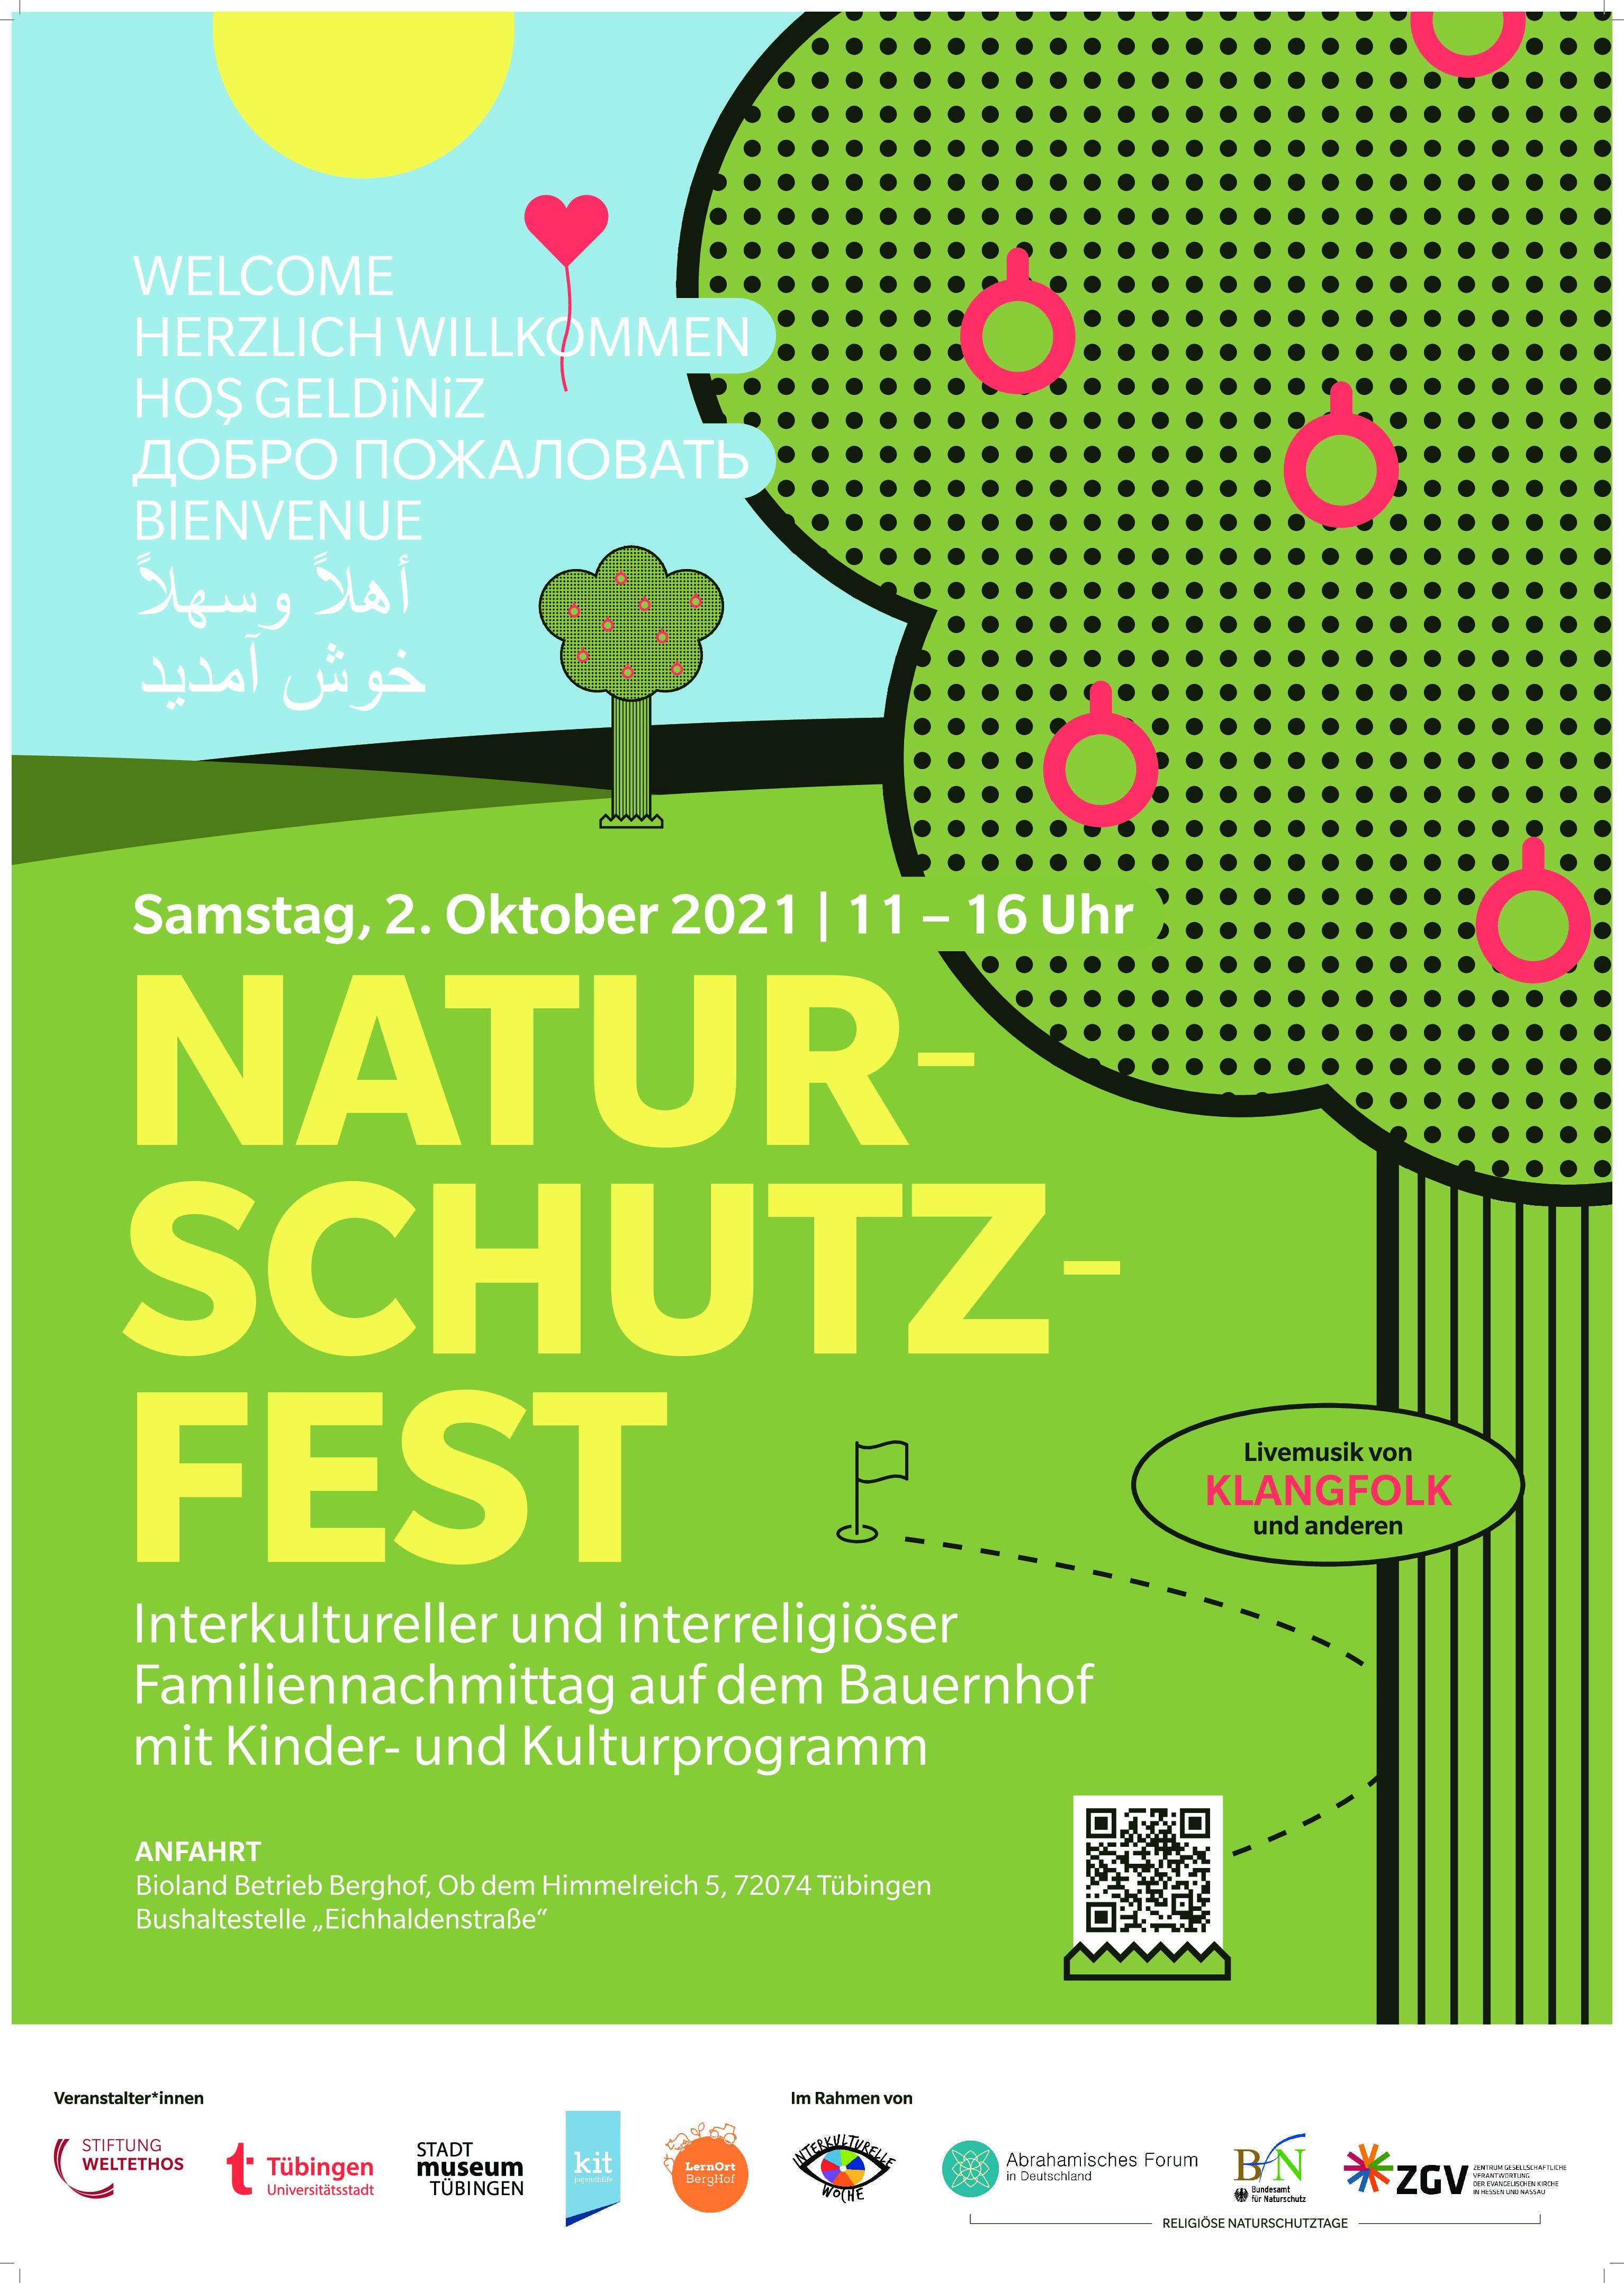 Tübingen: Naturschutzfest Tübingen